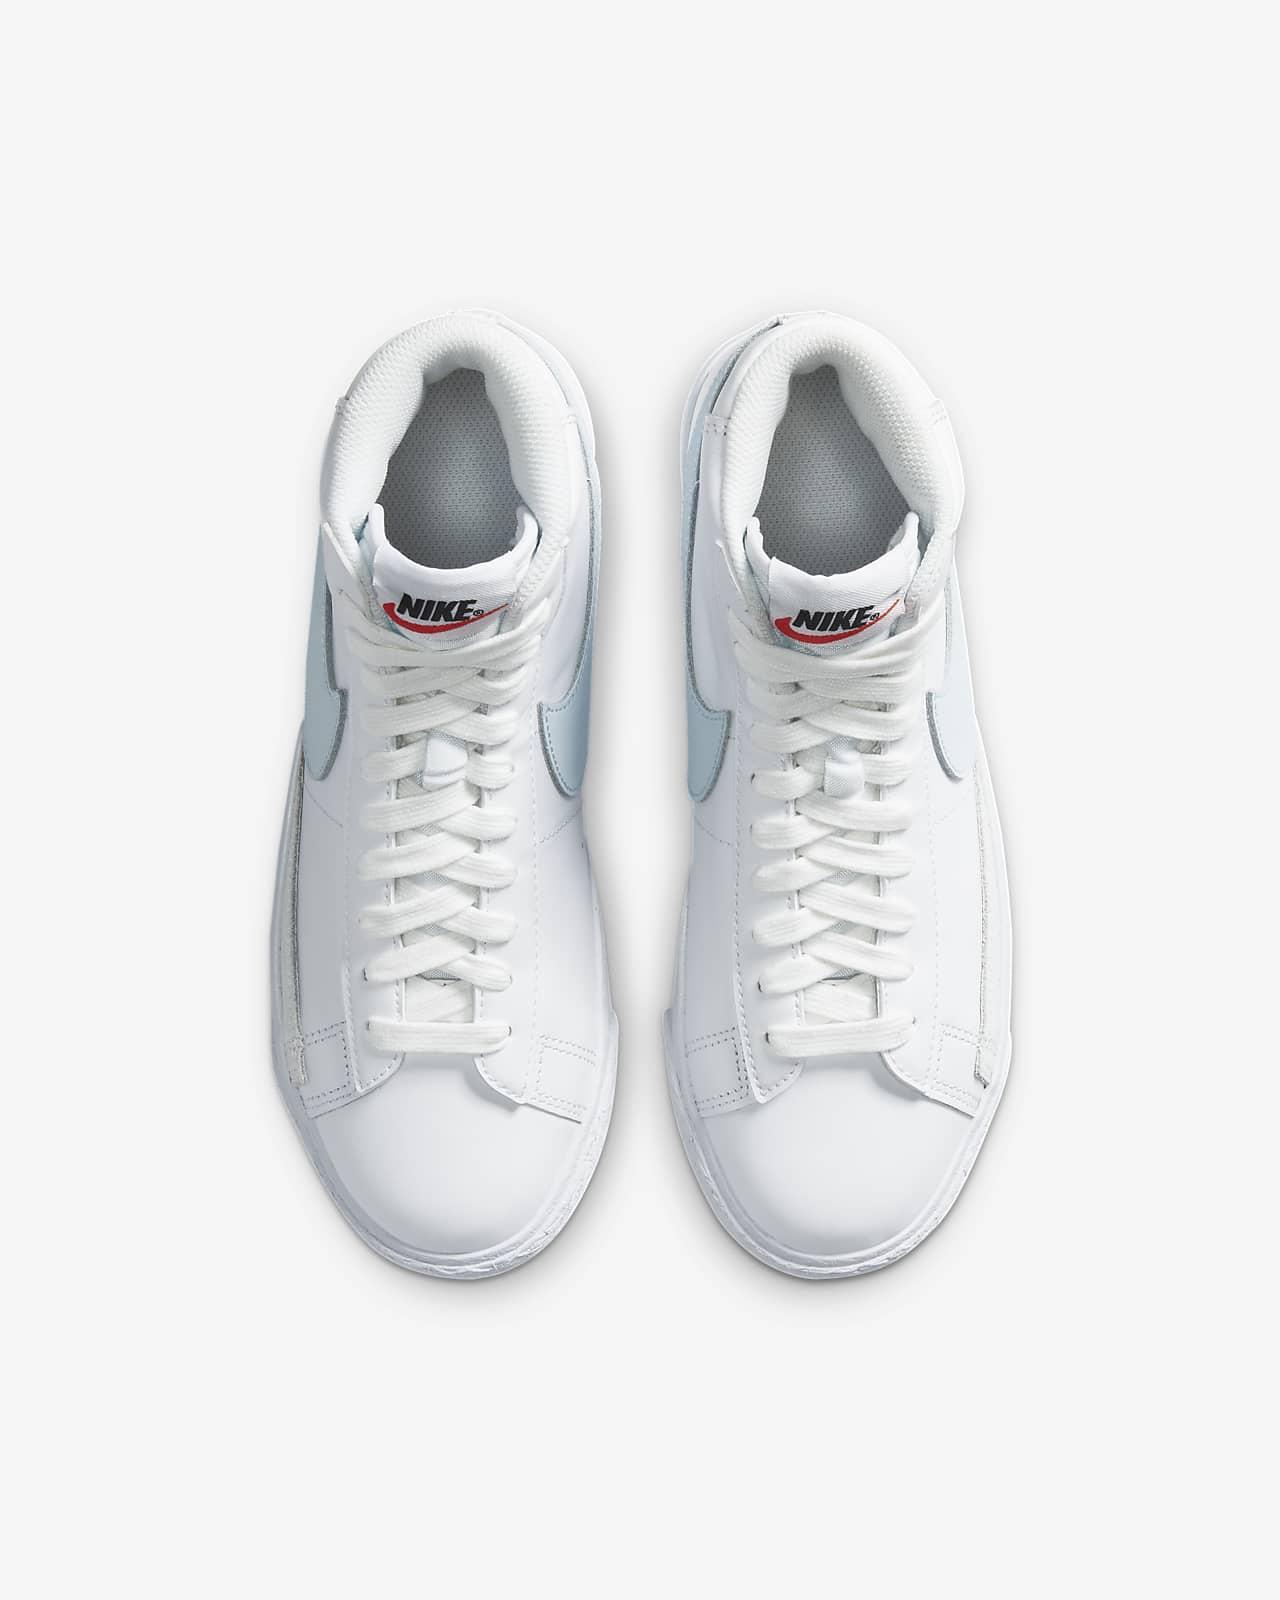 nike chaussure enfant garcons blanche 80